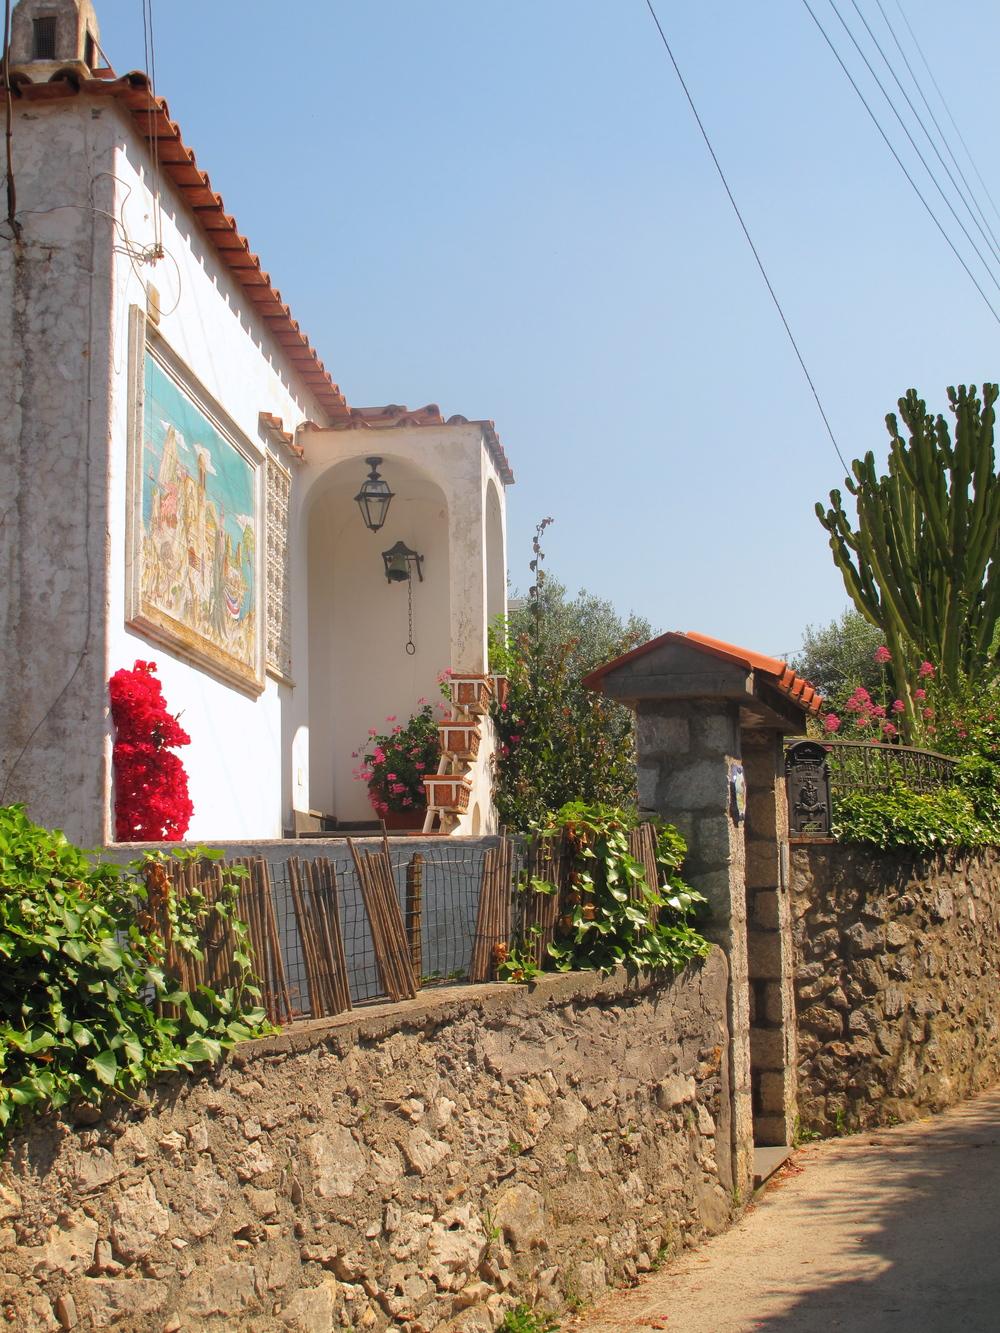 Cute little white houses on Anacapri